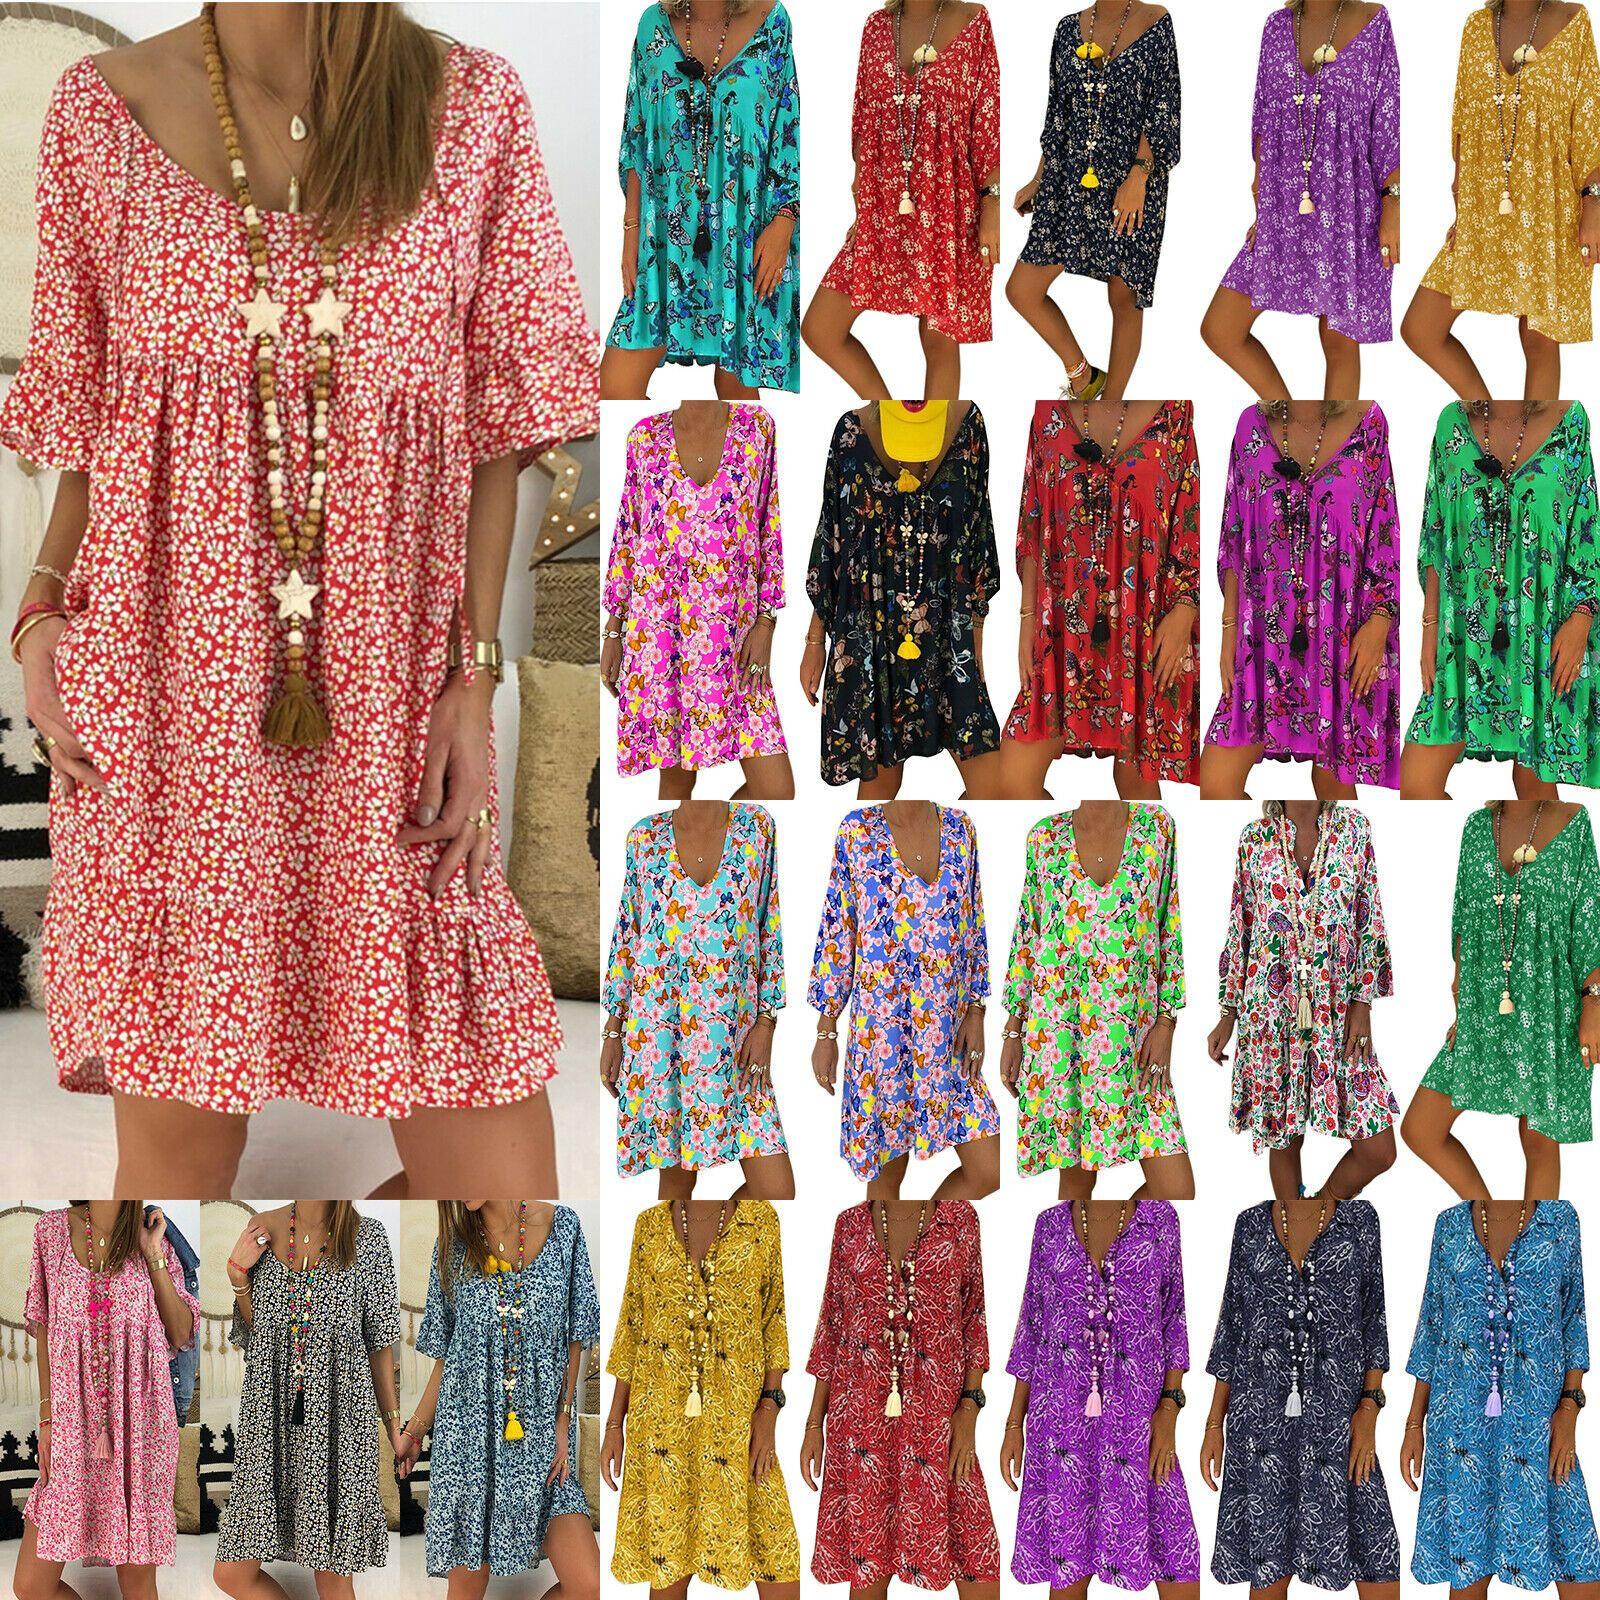 kleidung & accessoires de damen boho sommer minikleid